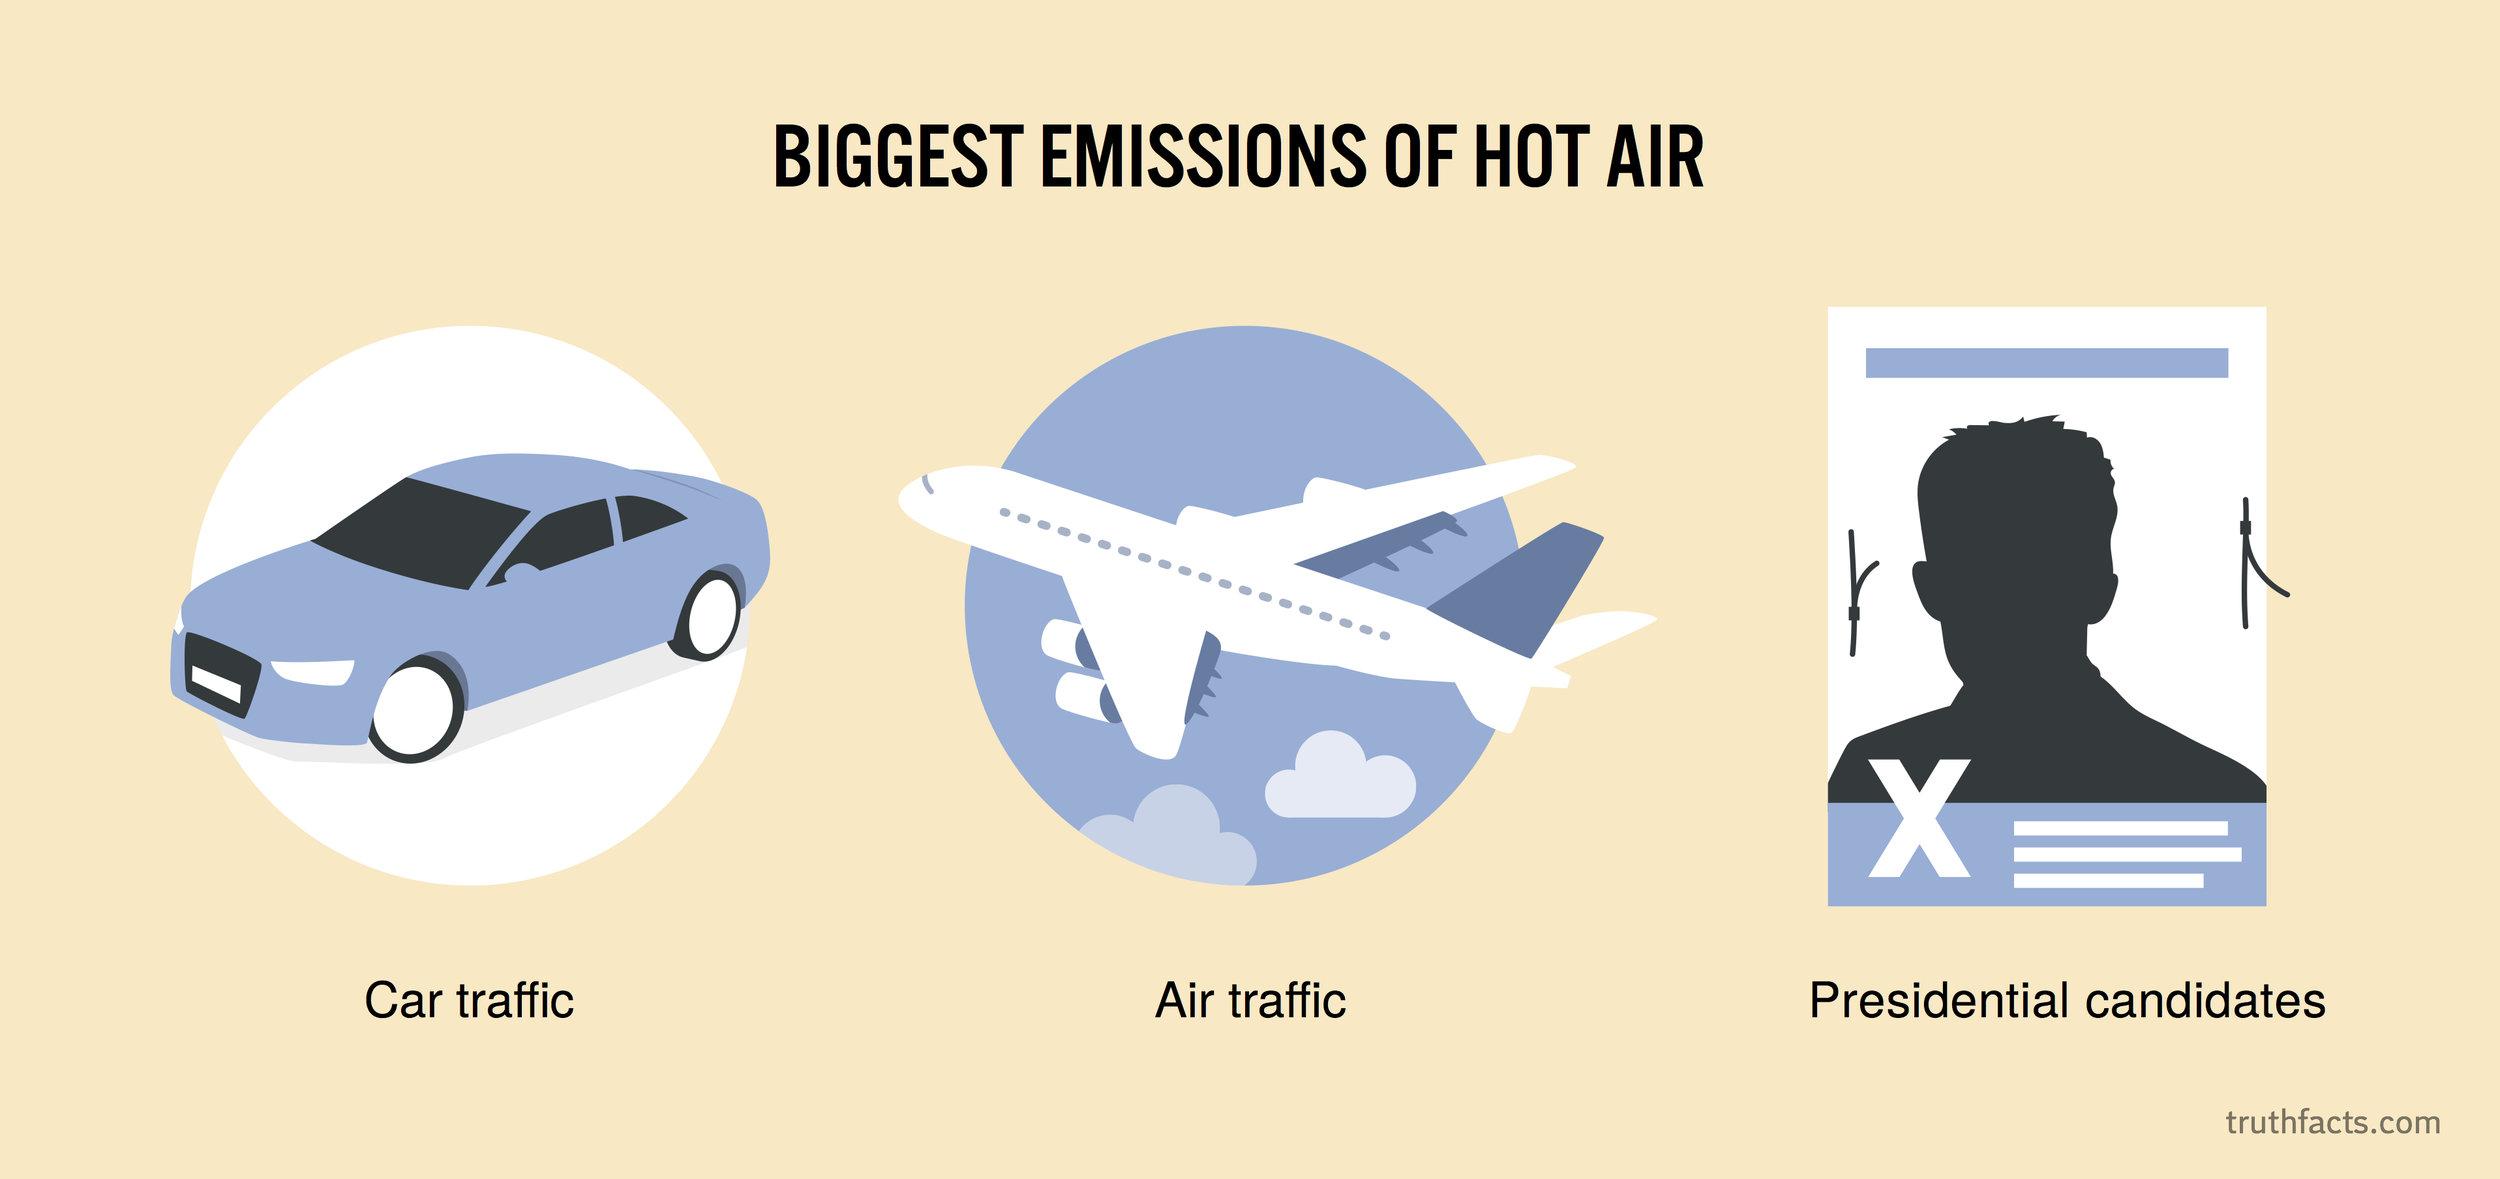 Biggest emissions of hot air